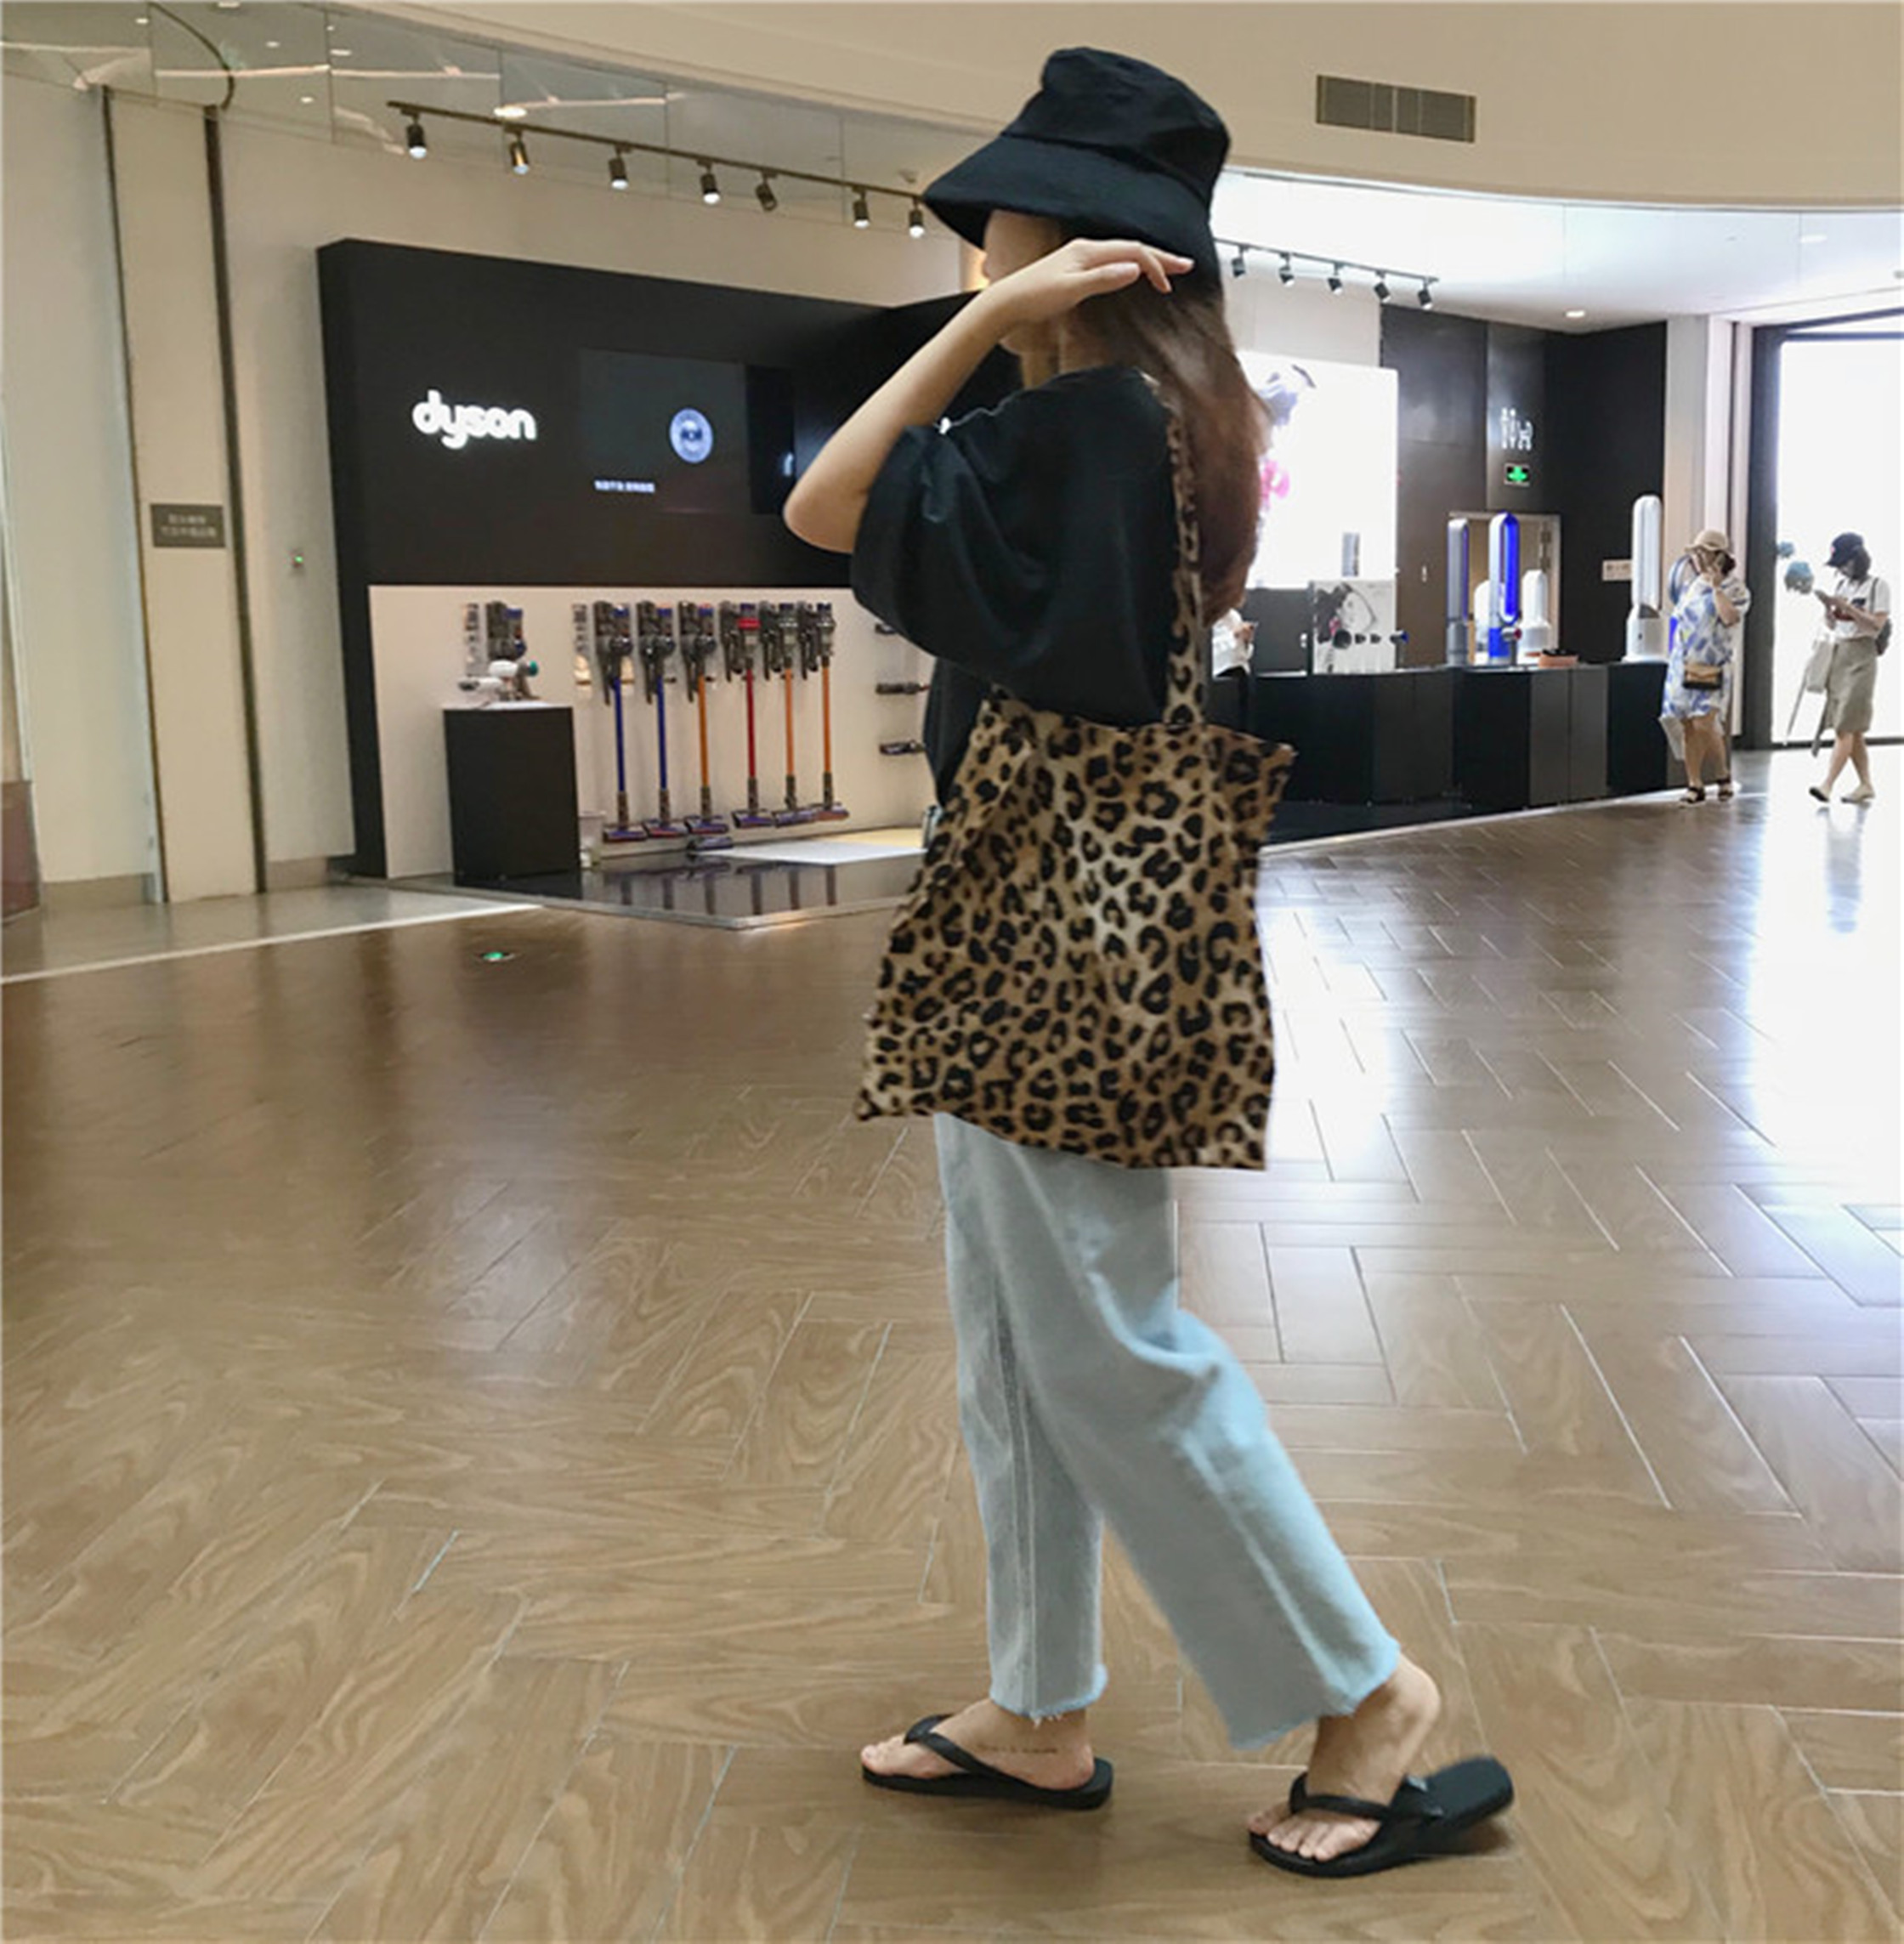 [ELINASEA]小海自制 复古时髦韩风豹纹印花单肩帆布包袋购物袋X